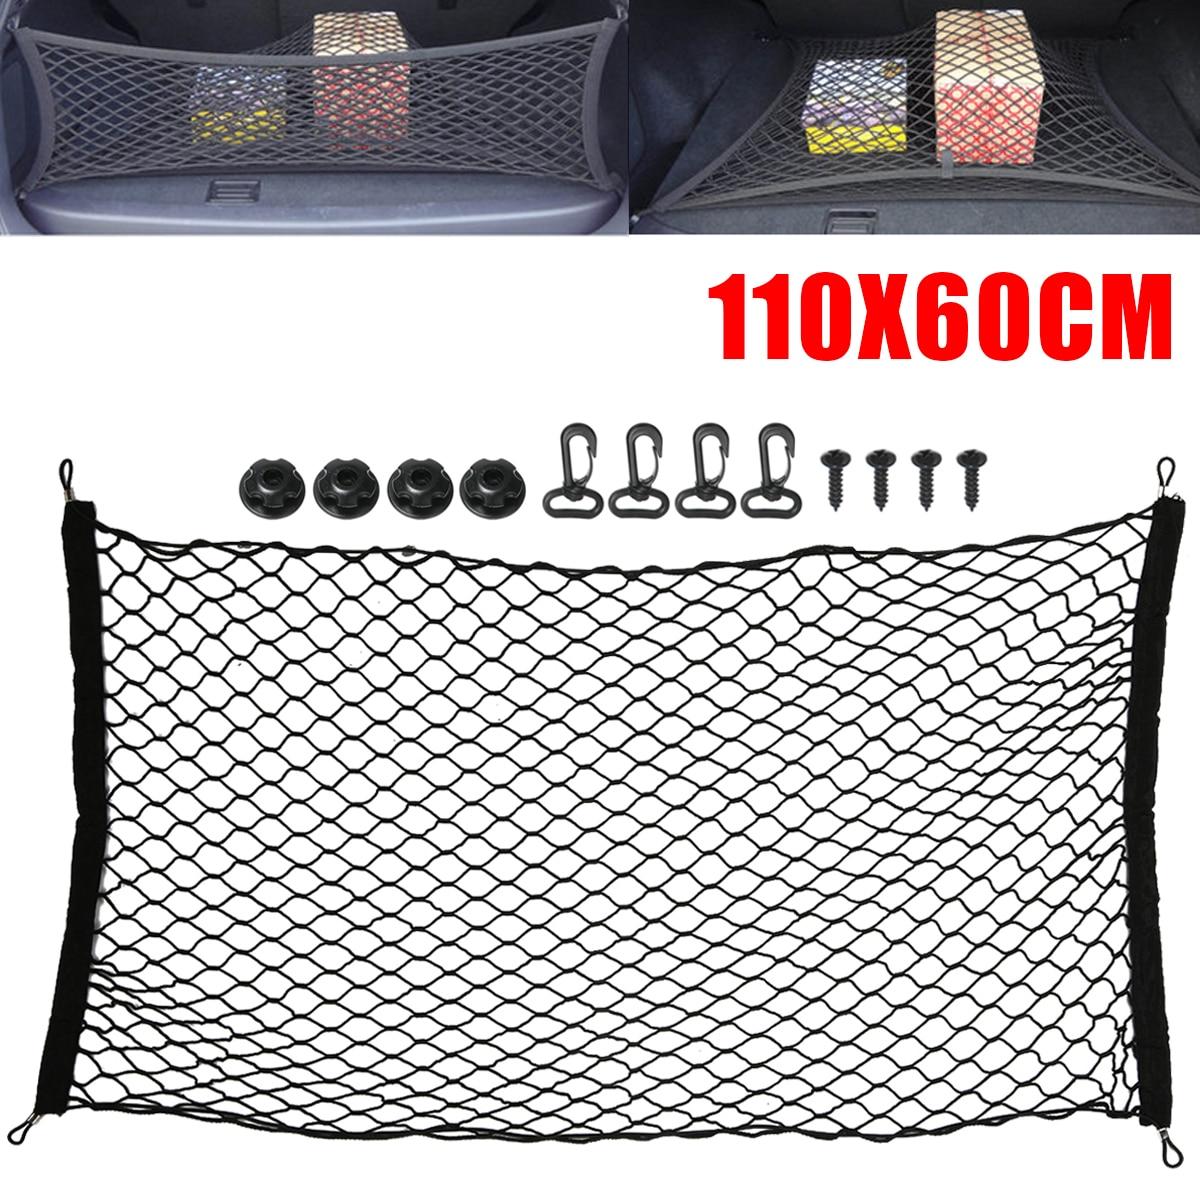 Universal Car Trunk Rear Storage Cargo Luggage Nylon Elastic Mesh 110x60 CM Net Holder With 4 Hooks Screws Adapters